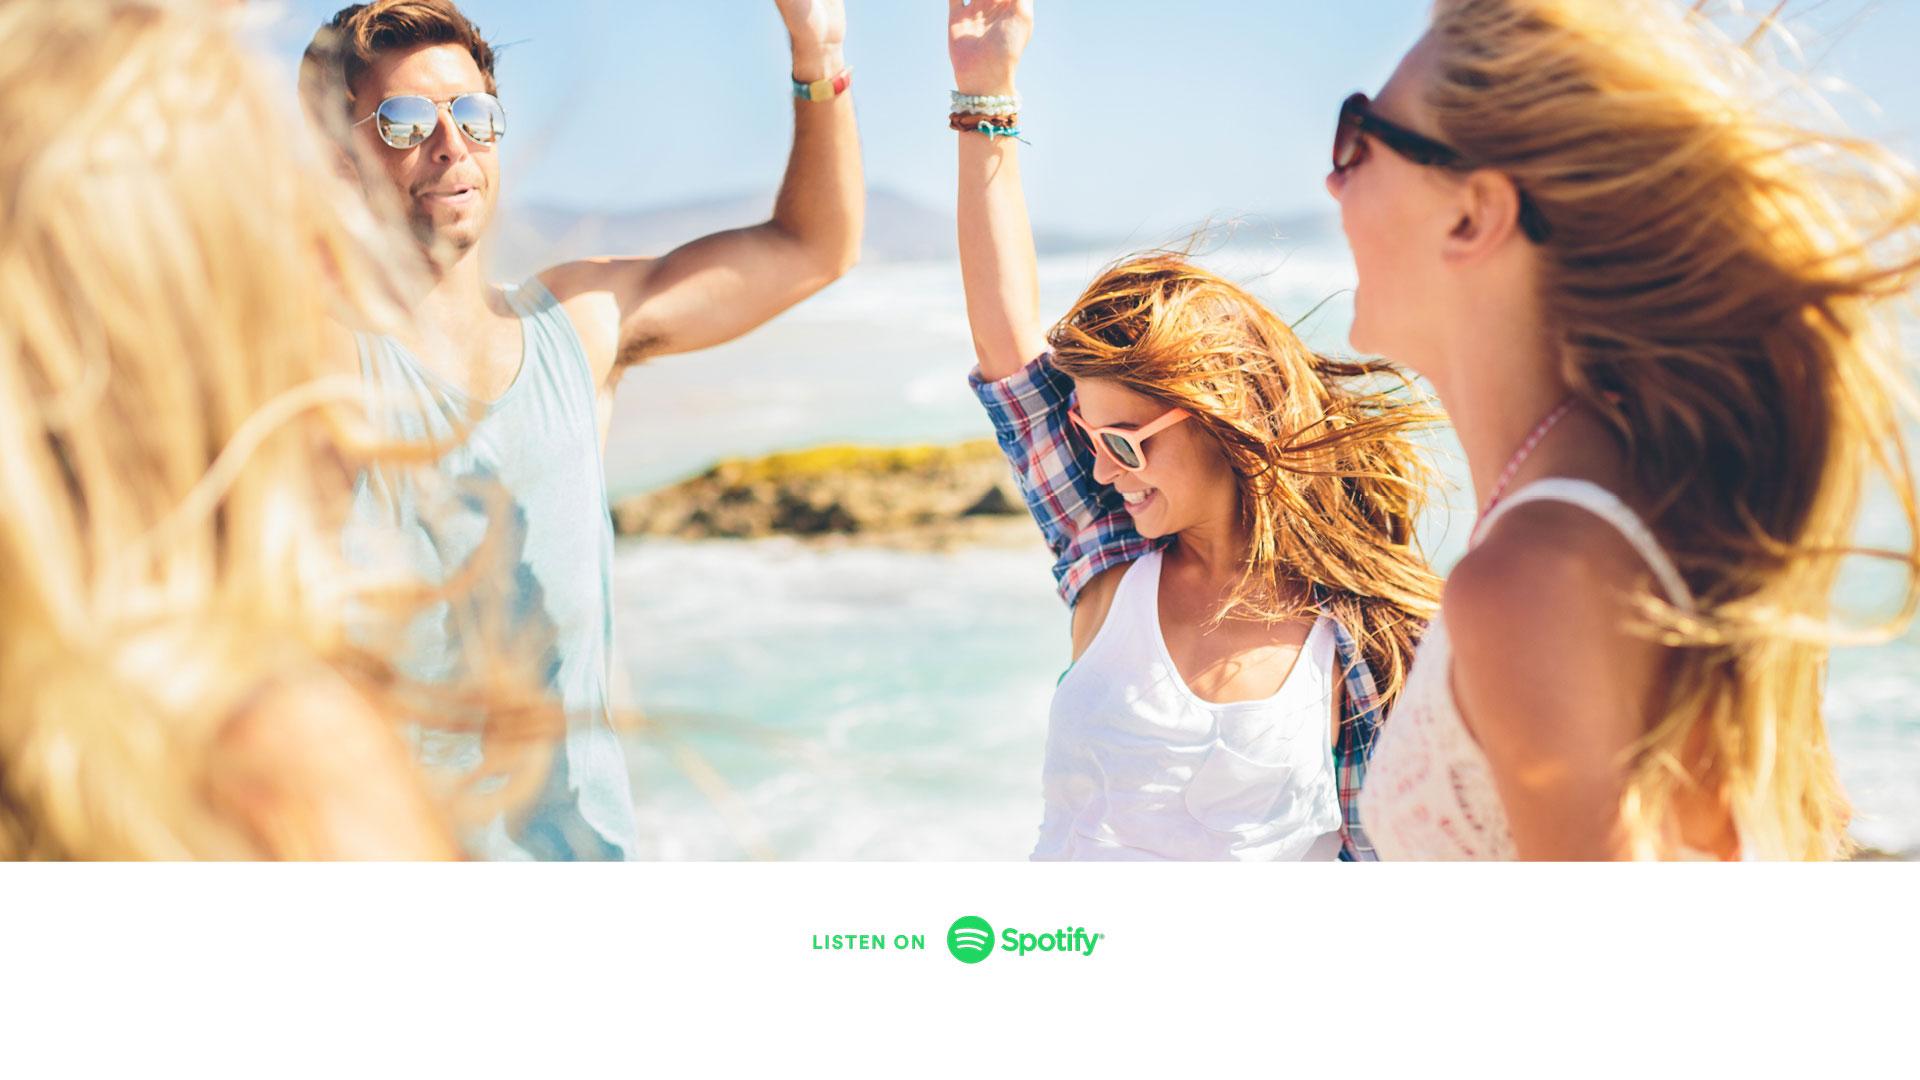 Spotify---Site-1920x1080-web